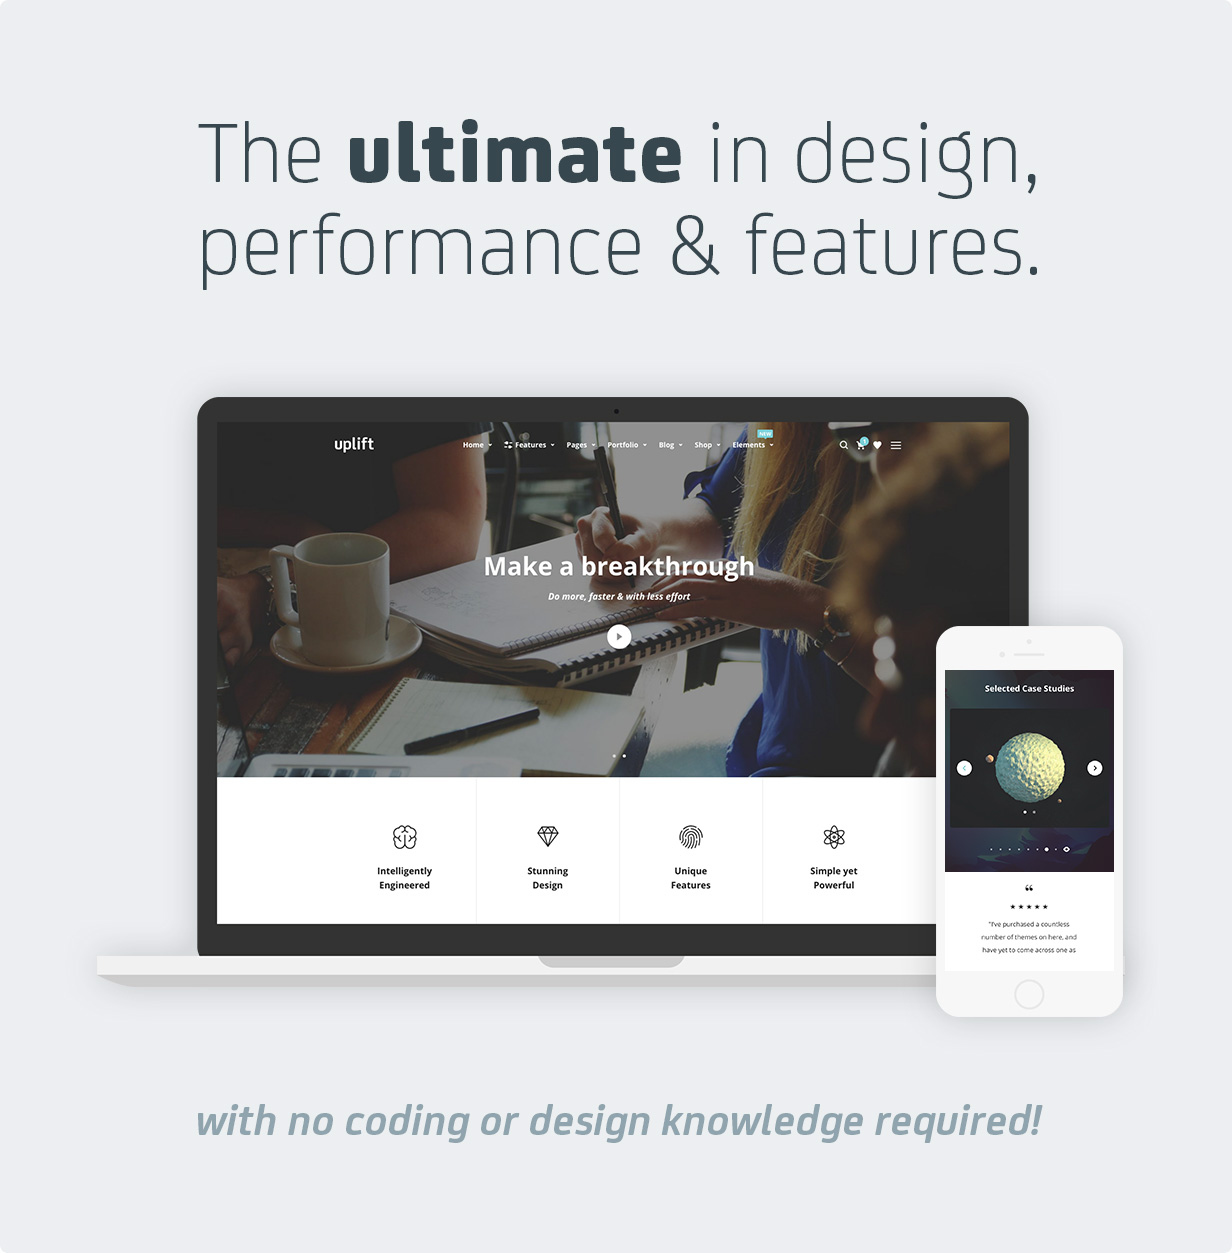 uplift 1 hero v3 - Uplift - Responsive Multi-Purpose WordPress Theme